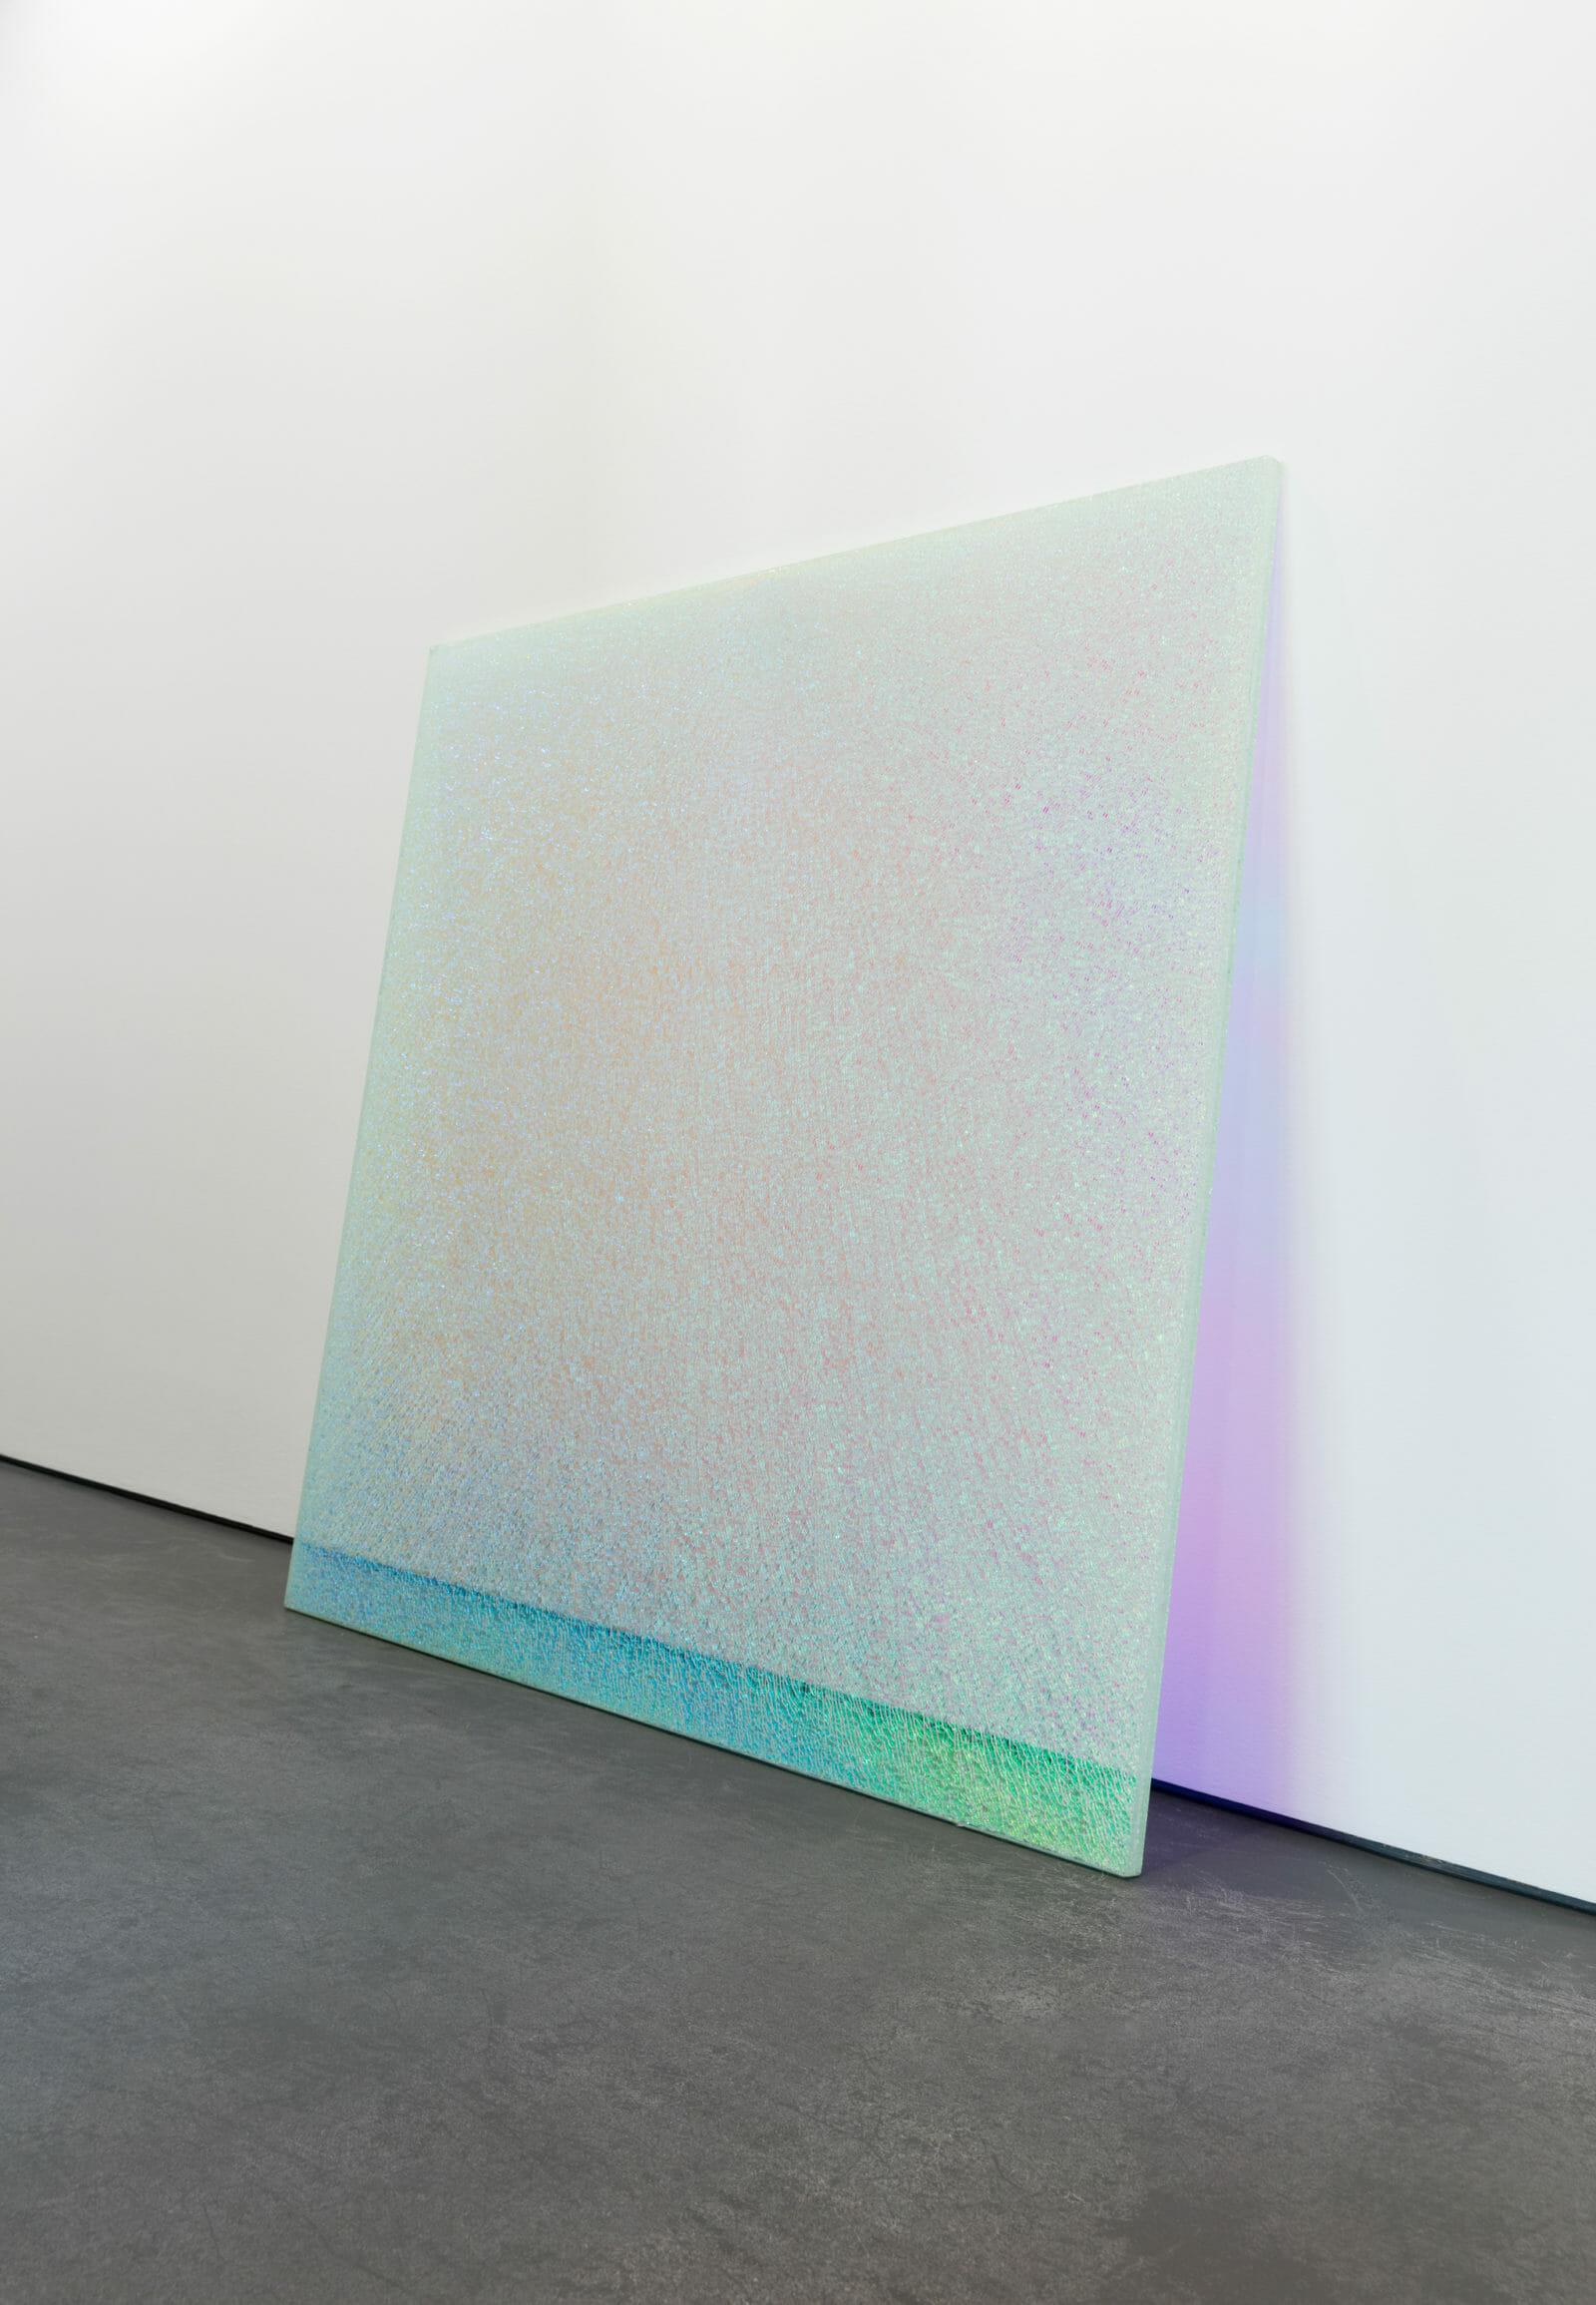 Ann Veronica Janssens, Magic Mirror Pink #2, 2013-2016 120 x 120 x 1,8 cm Film dichroïque, verre de sécurité, verre flotté, serial collector, article de mina sidi ali